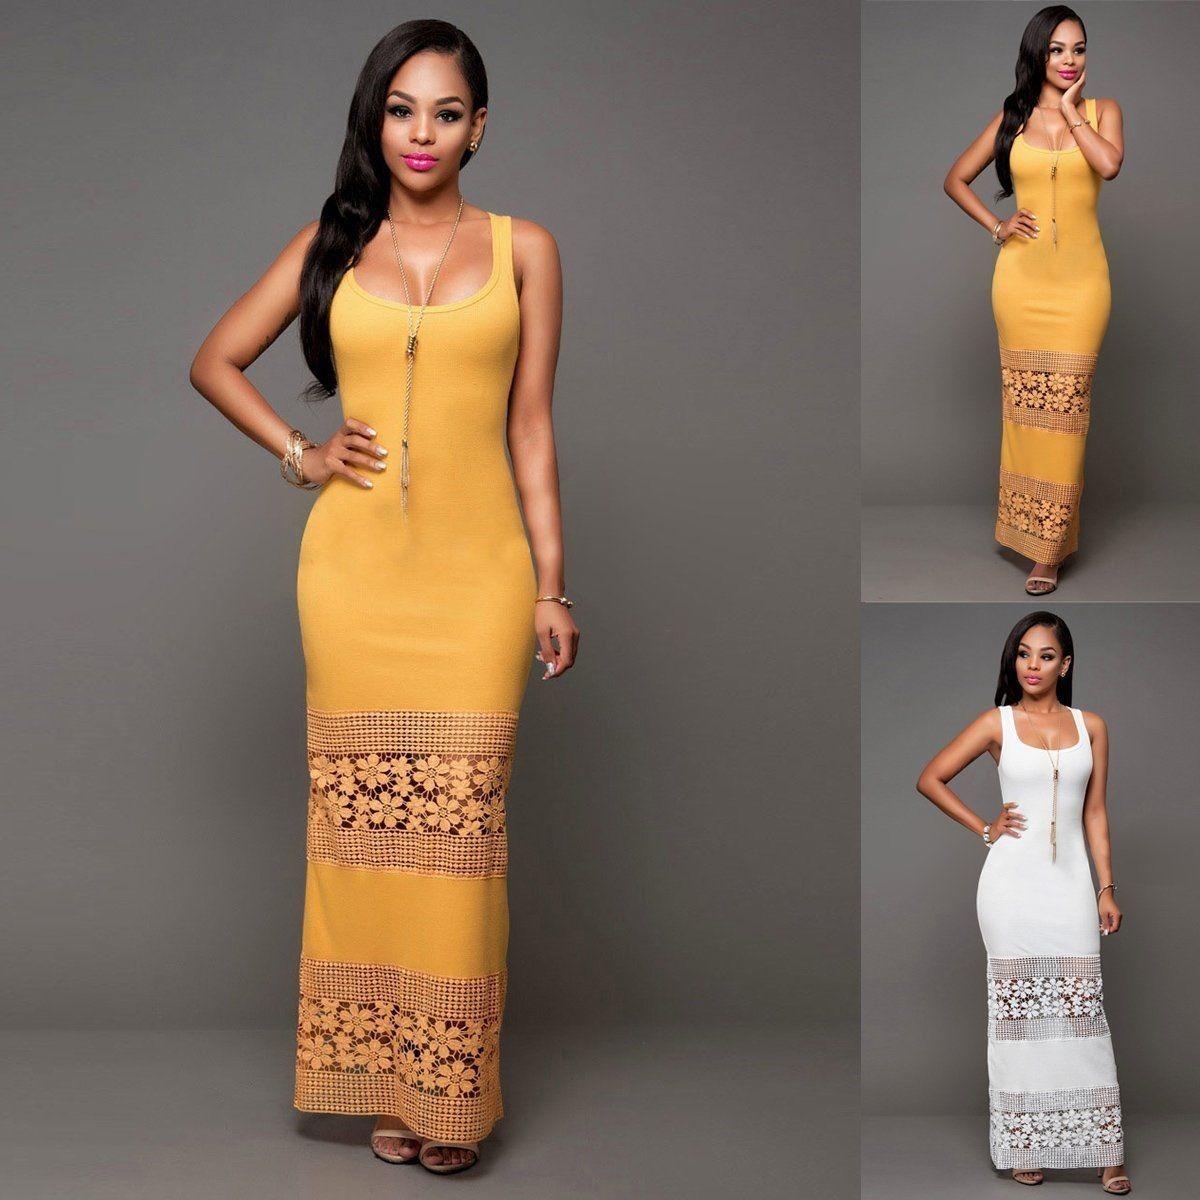 9e0dc53e26ce5 Vestidos largos bonitos económicos elegantes casual jpg 1200x1200 Bonito  vestidos casuales elegantes